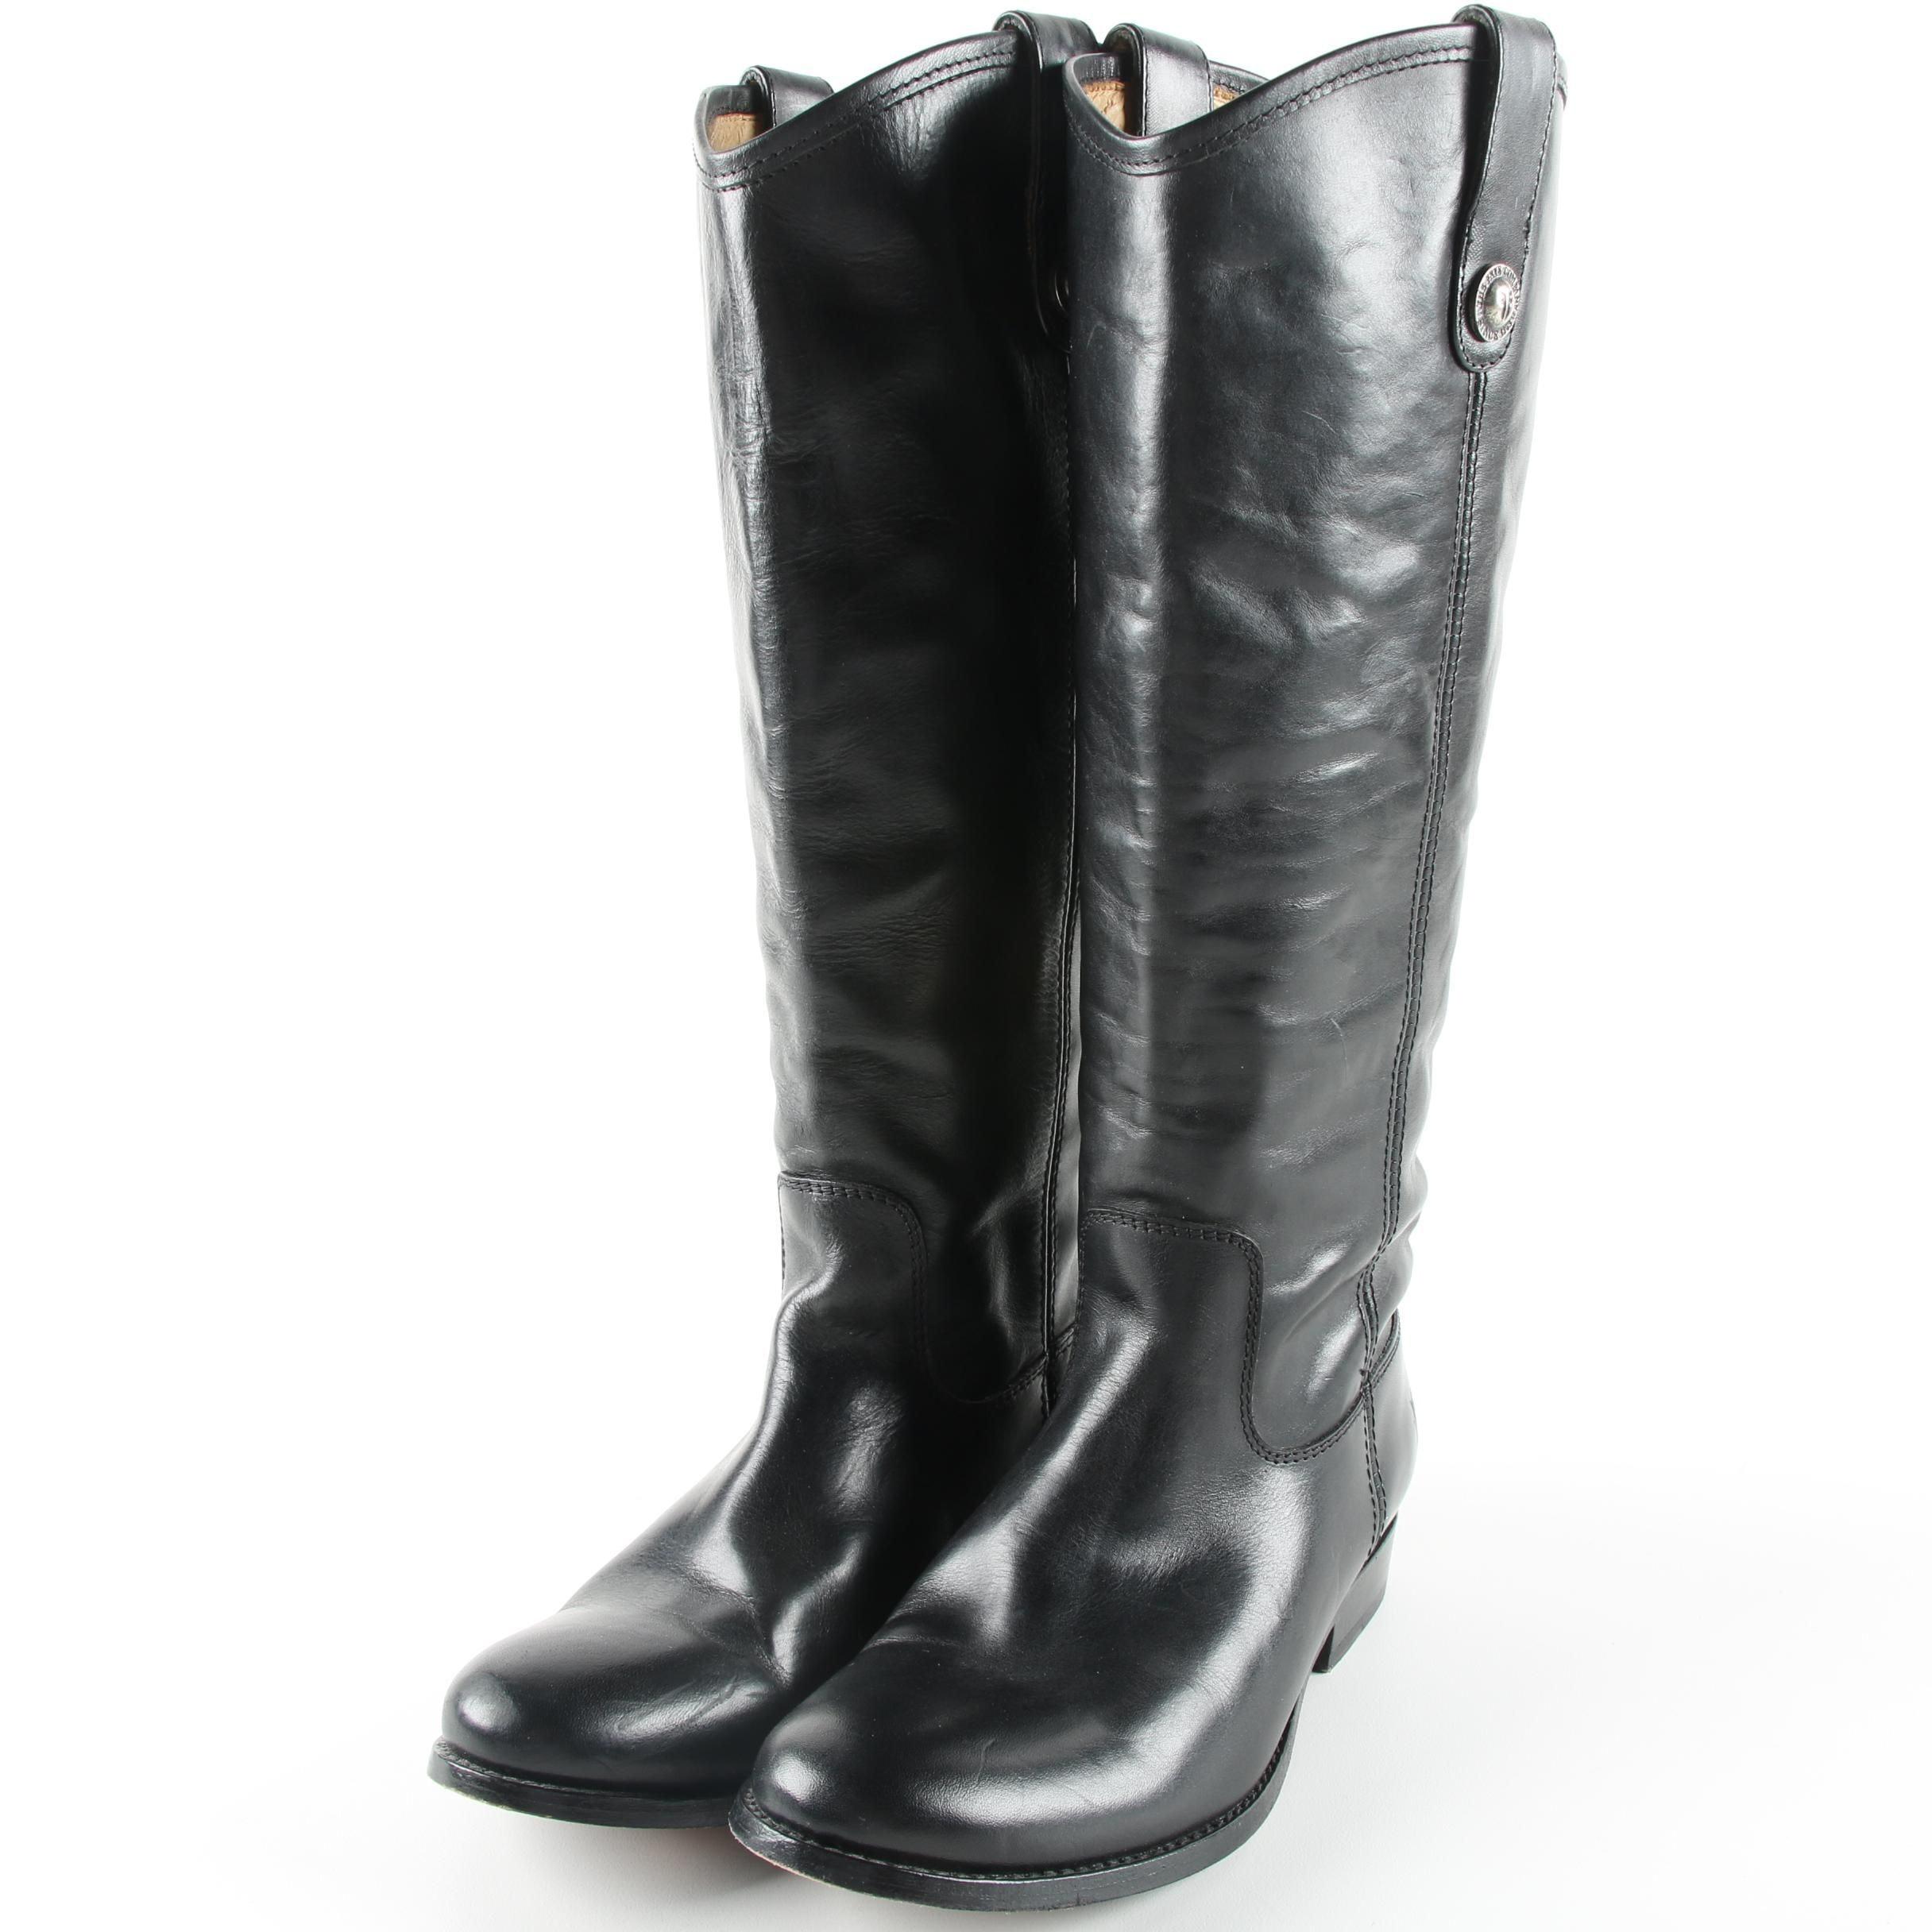 Women's Frye Black Leather Boots